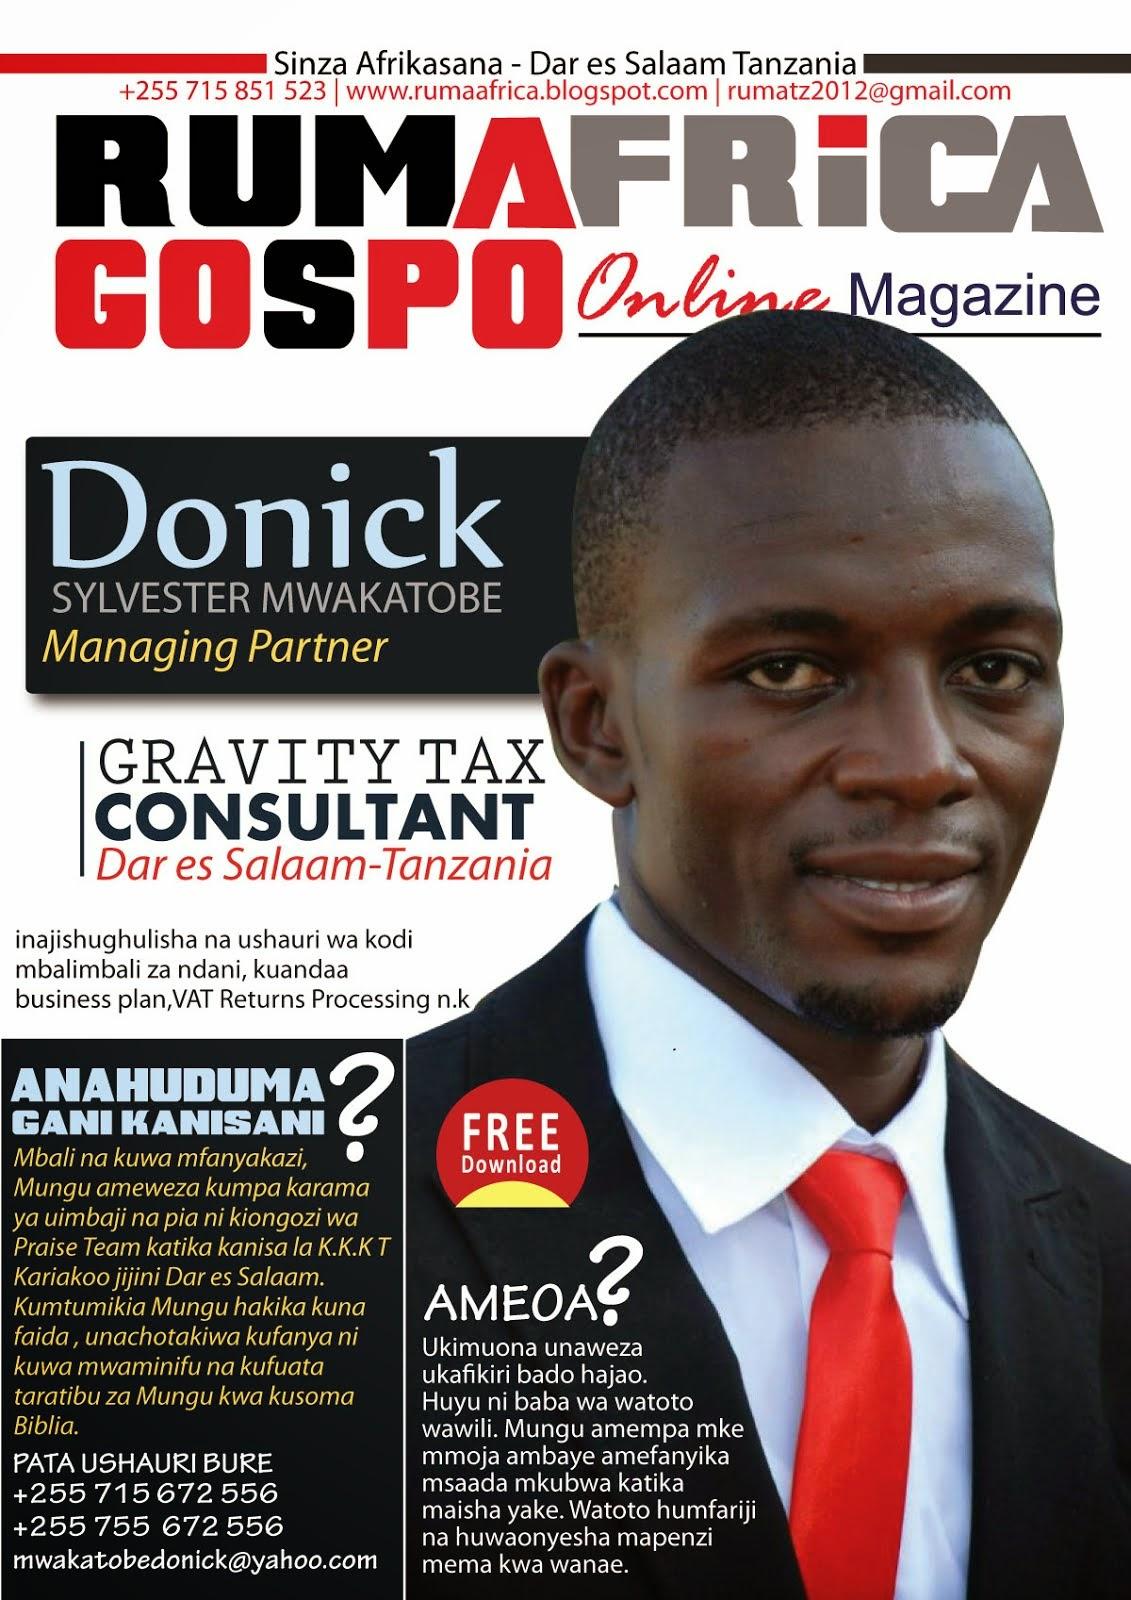 DONICK NDANI YA RUMAFRICA Online MAGAZINE